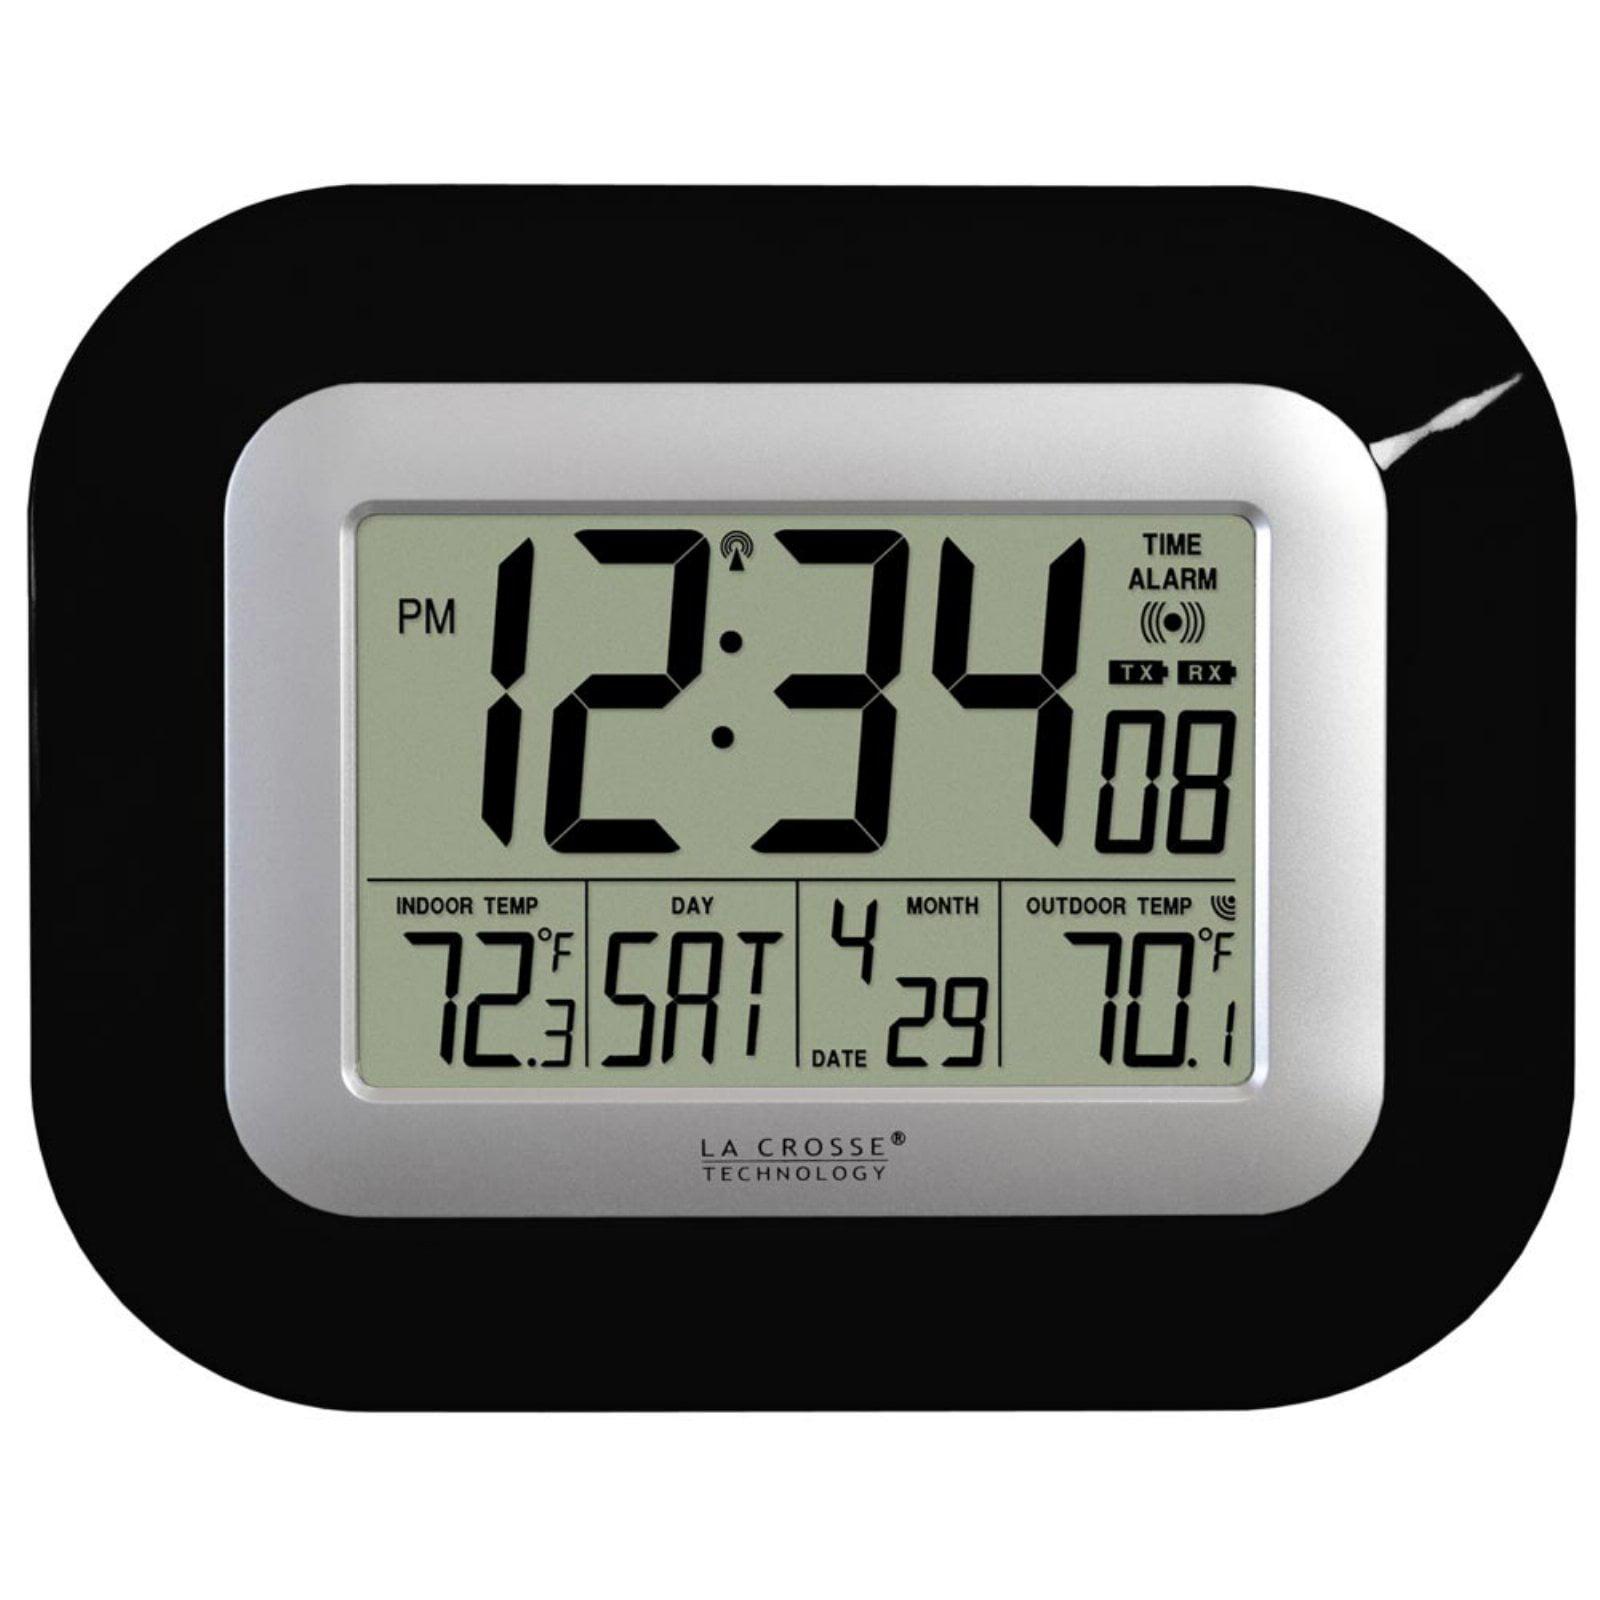 Atomic Digital Wall or Desk Clock (Black) by LaCrosse Technology